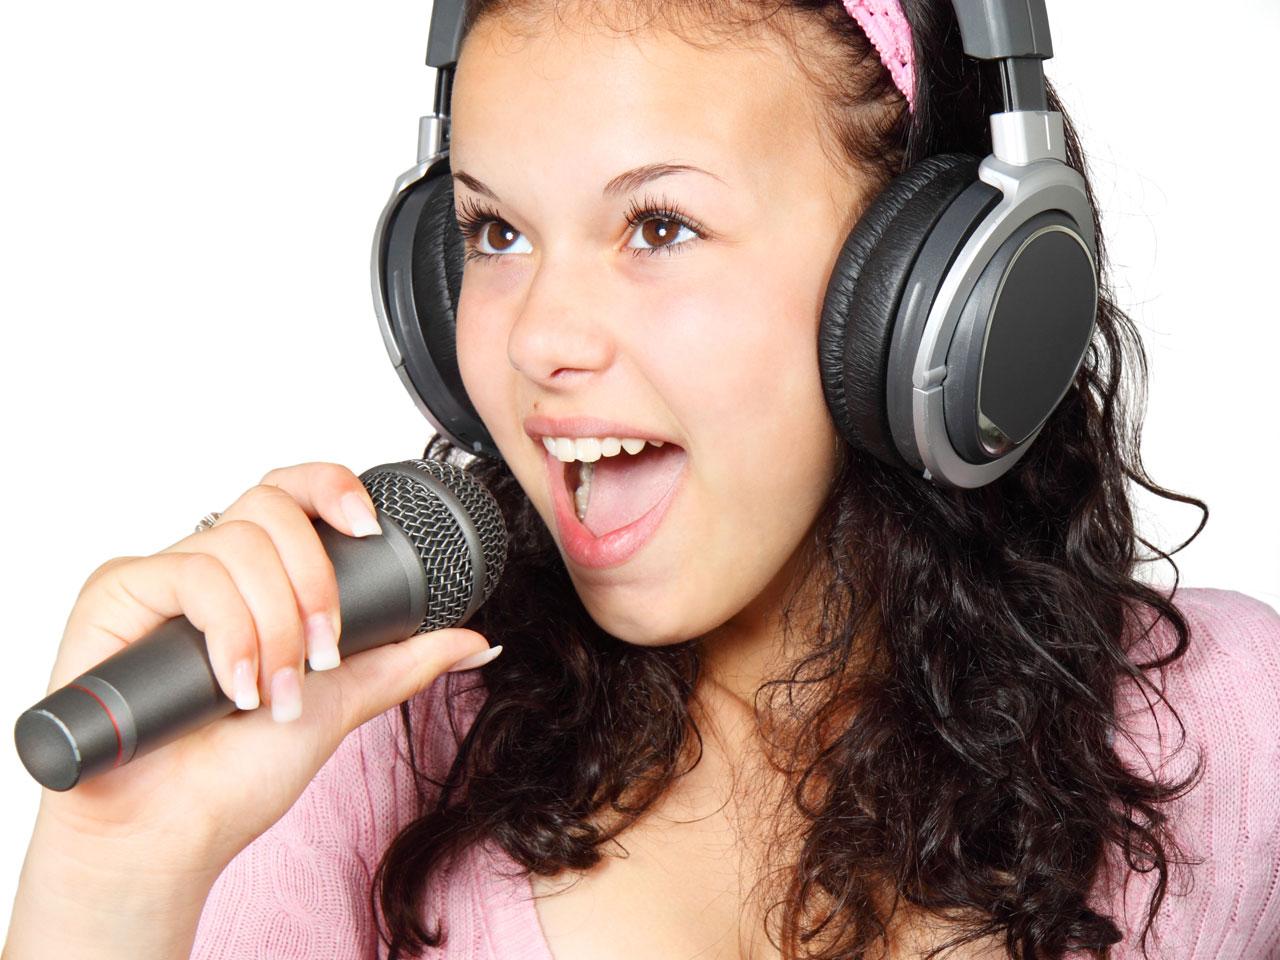 fille jeune fille adolescente chanter casque audio micro